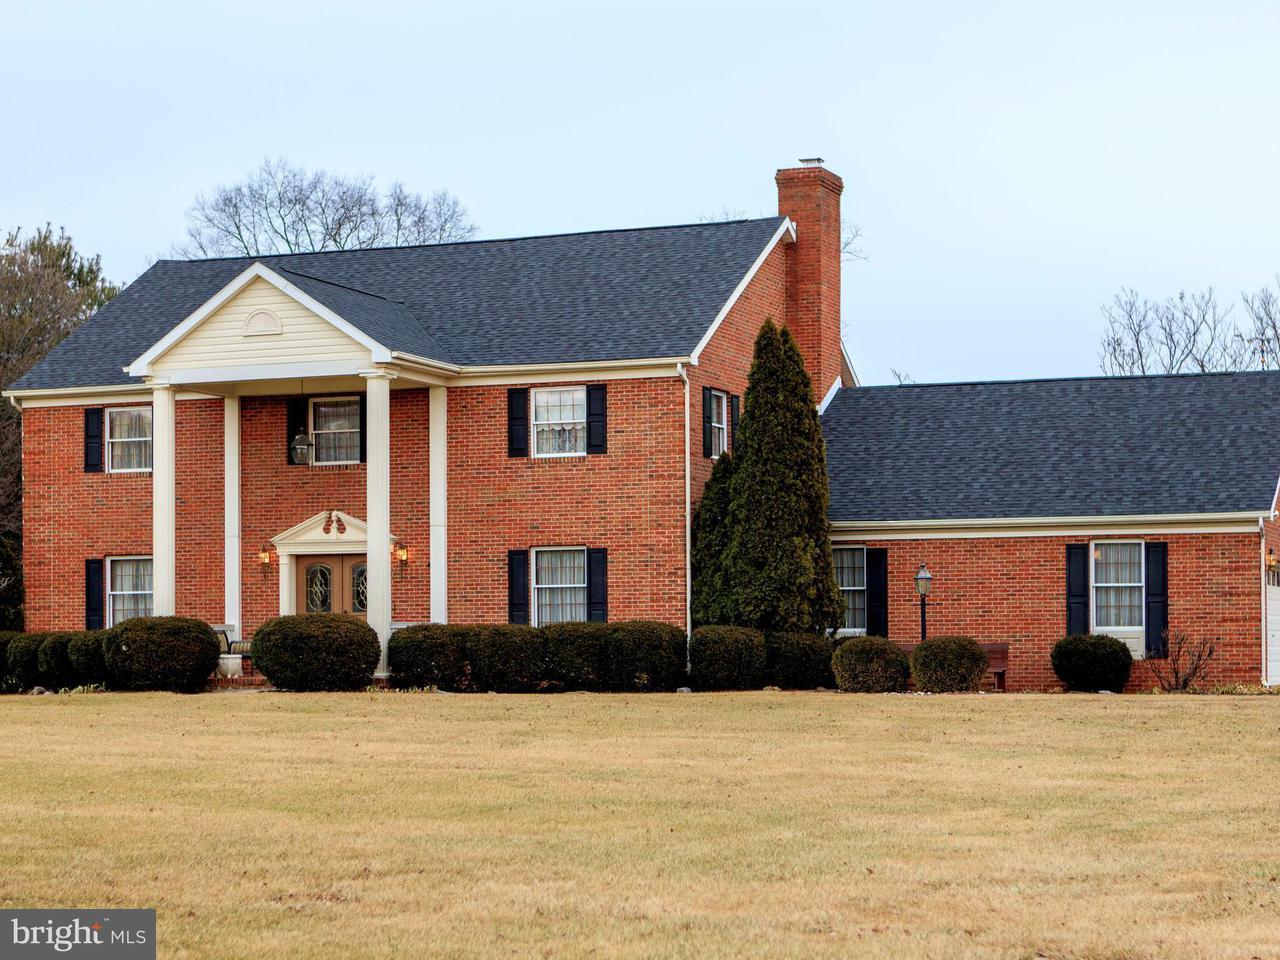 Single Family Home for Sale at 794 Horizon Way 794 Horizon Way Martinsburg, West Virginia 25403 United States